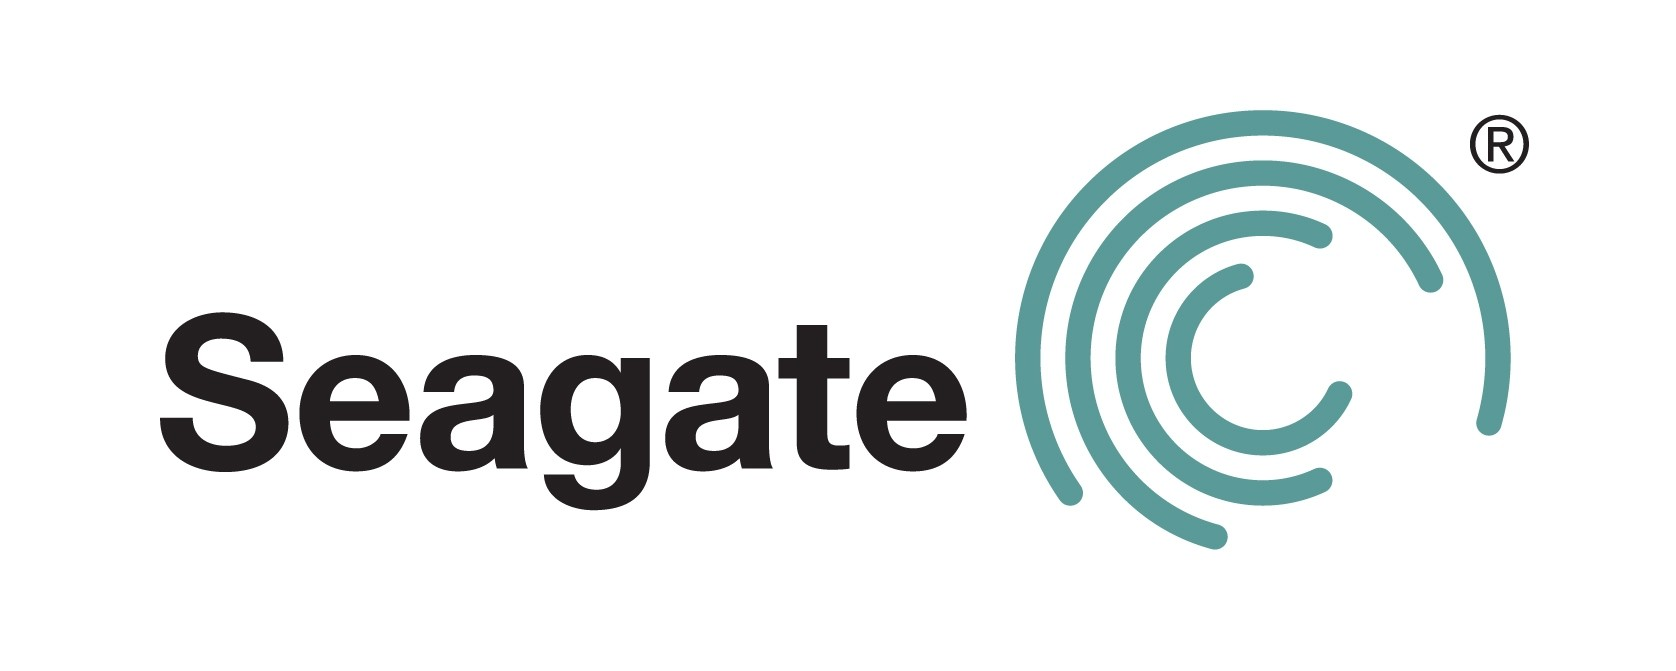 Seagate Logo - Seagate hoàn tất mua lại bộ phận kinh doanh Flash của LSI từ Avago